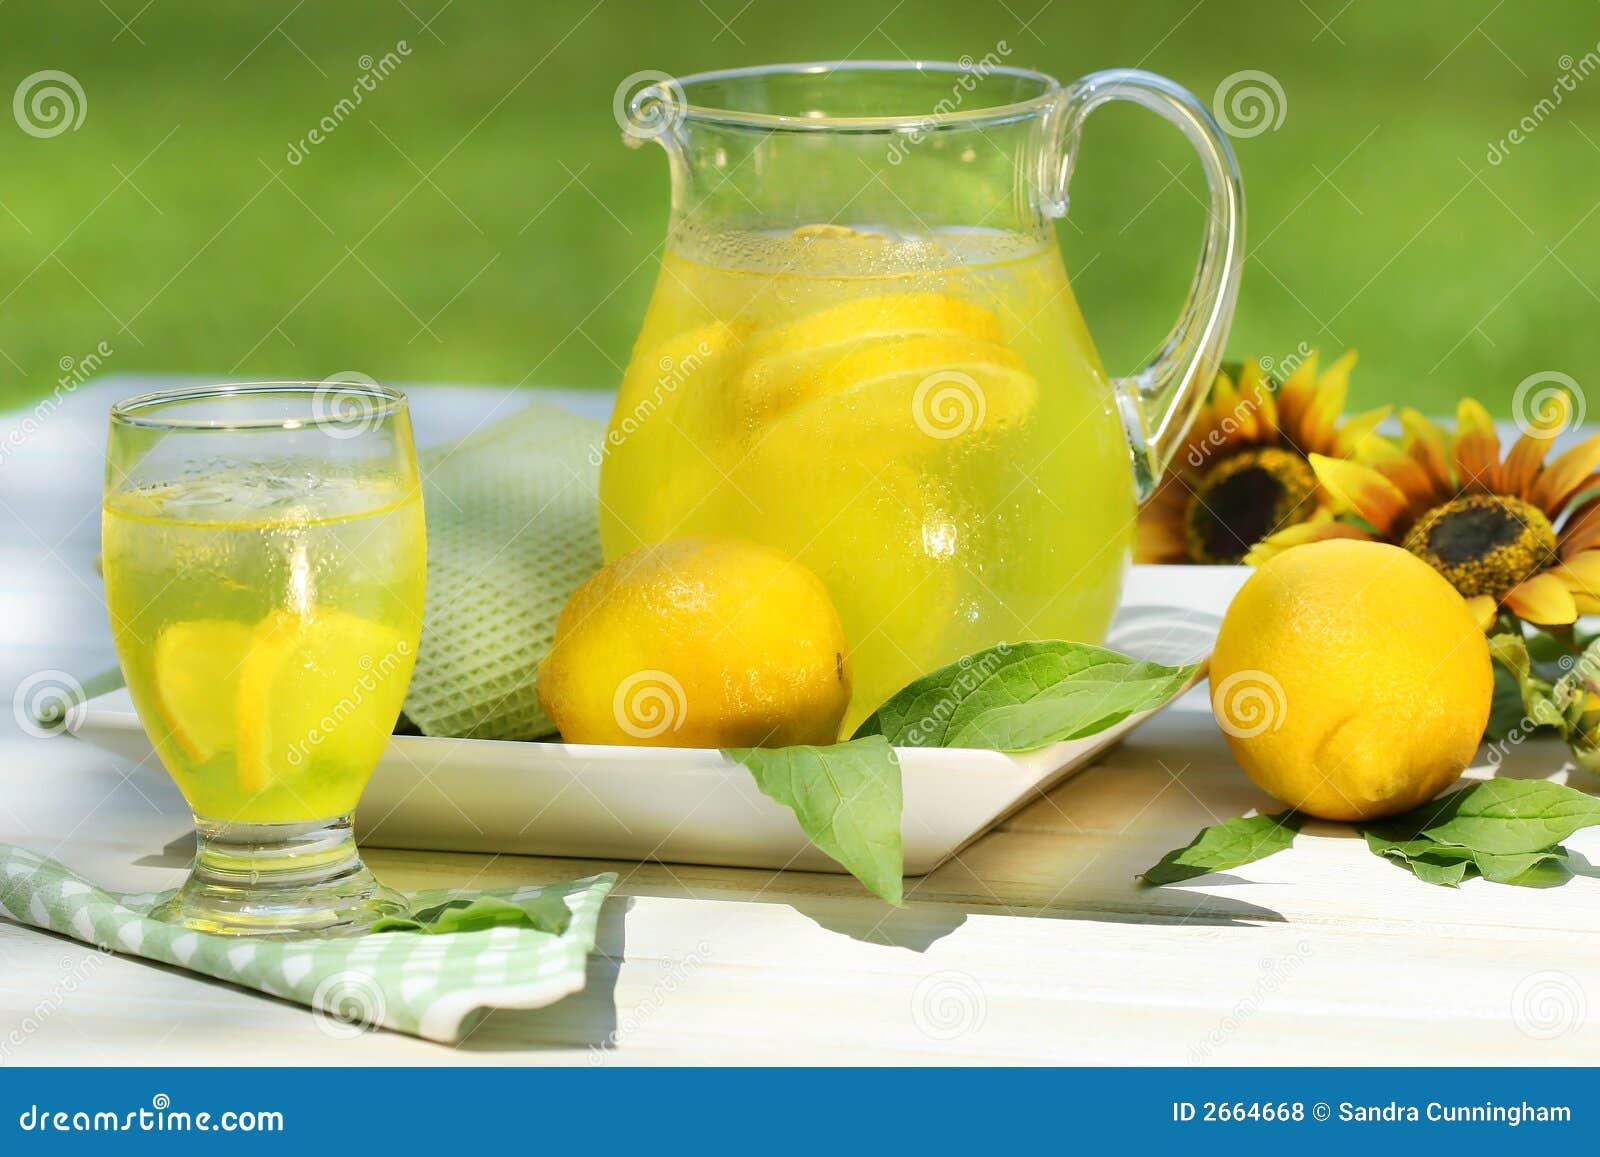 Jarra de limonada fresca